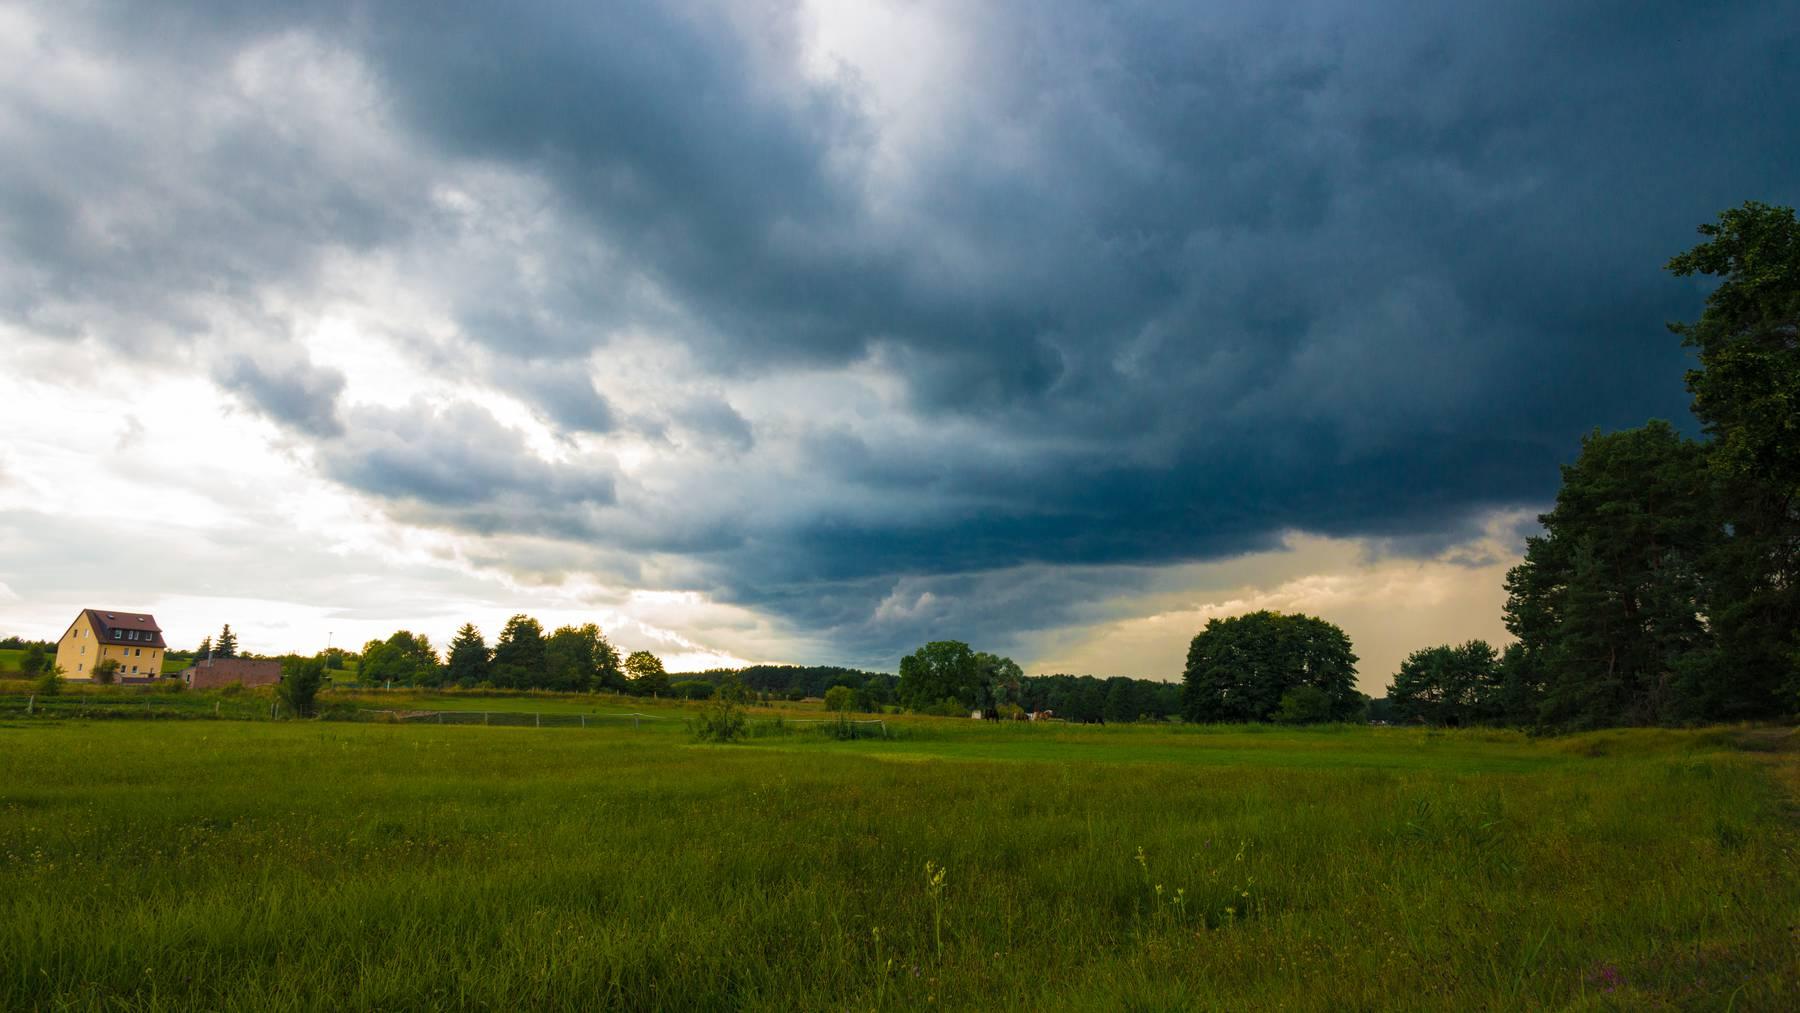 Wetter Gewitter Sturm